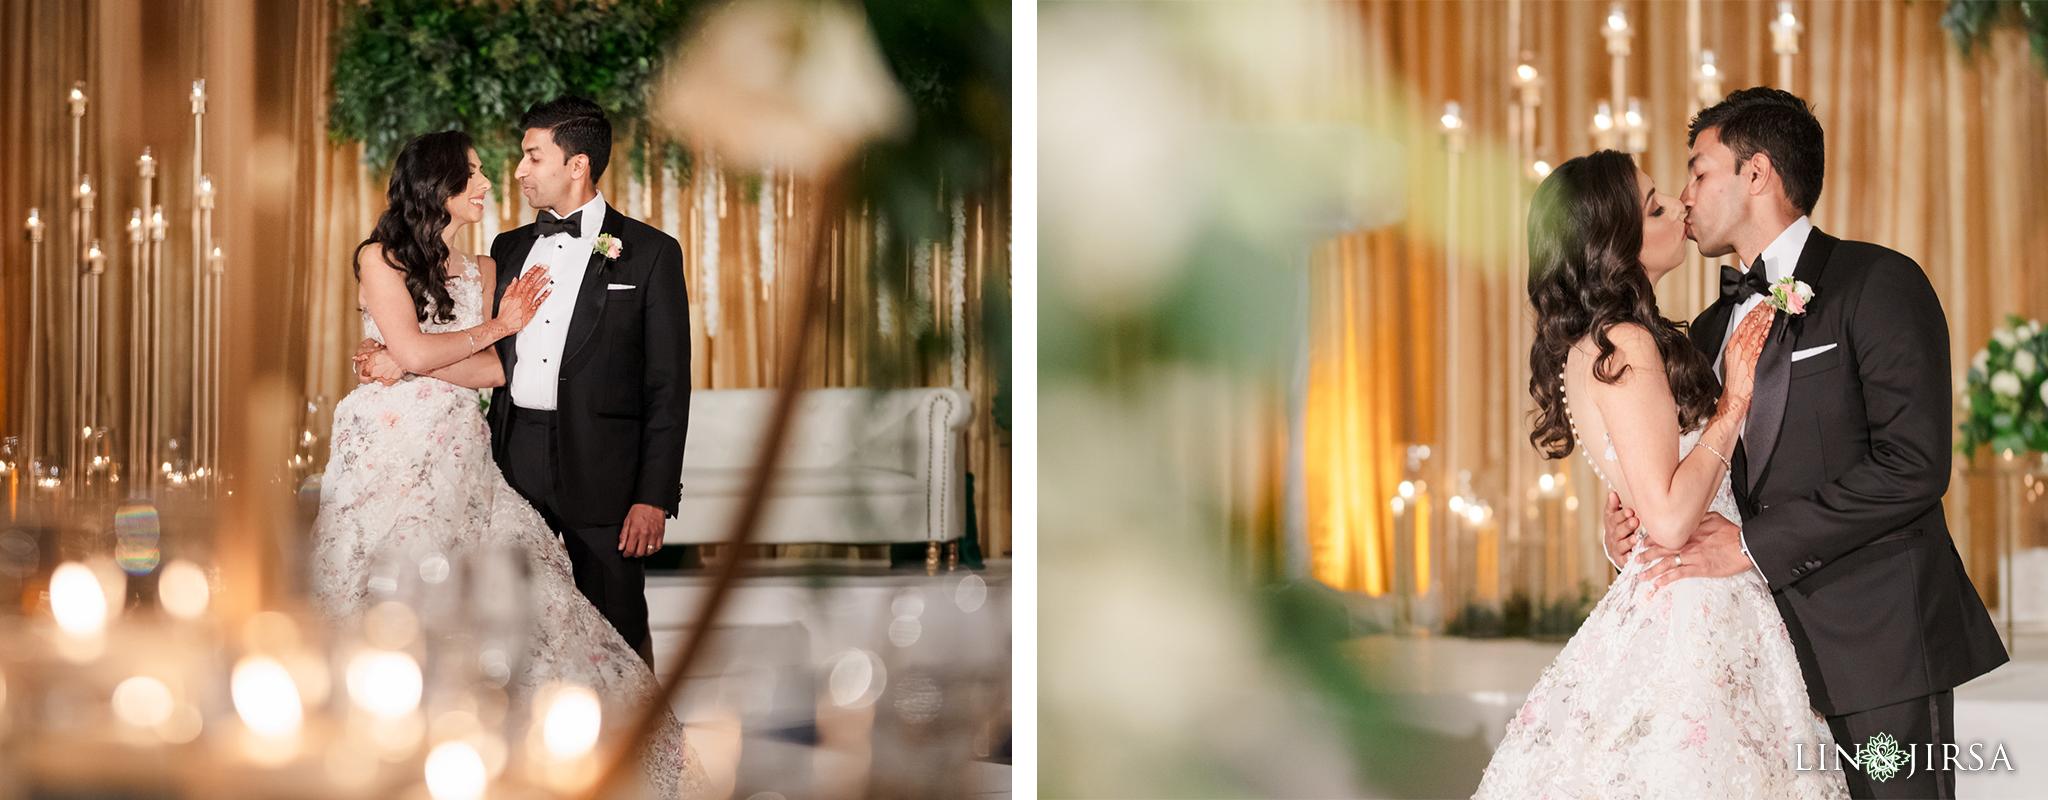 26 Newport Beach Marriott Indian Wedding Photography